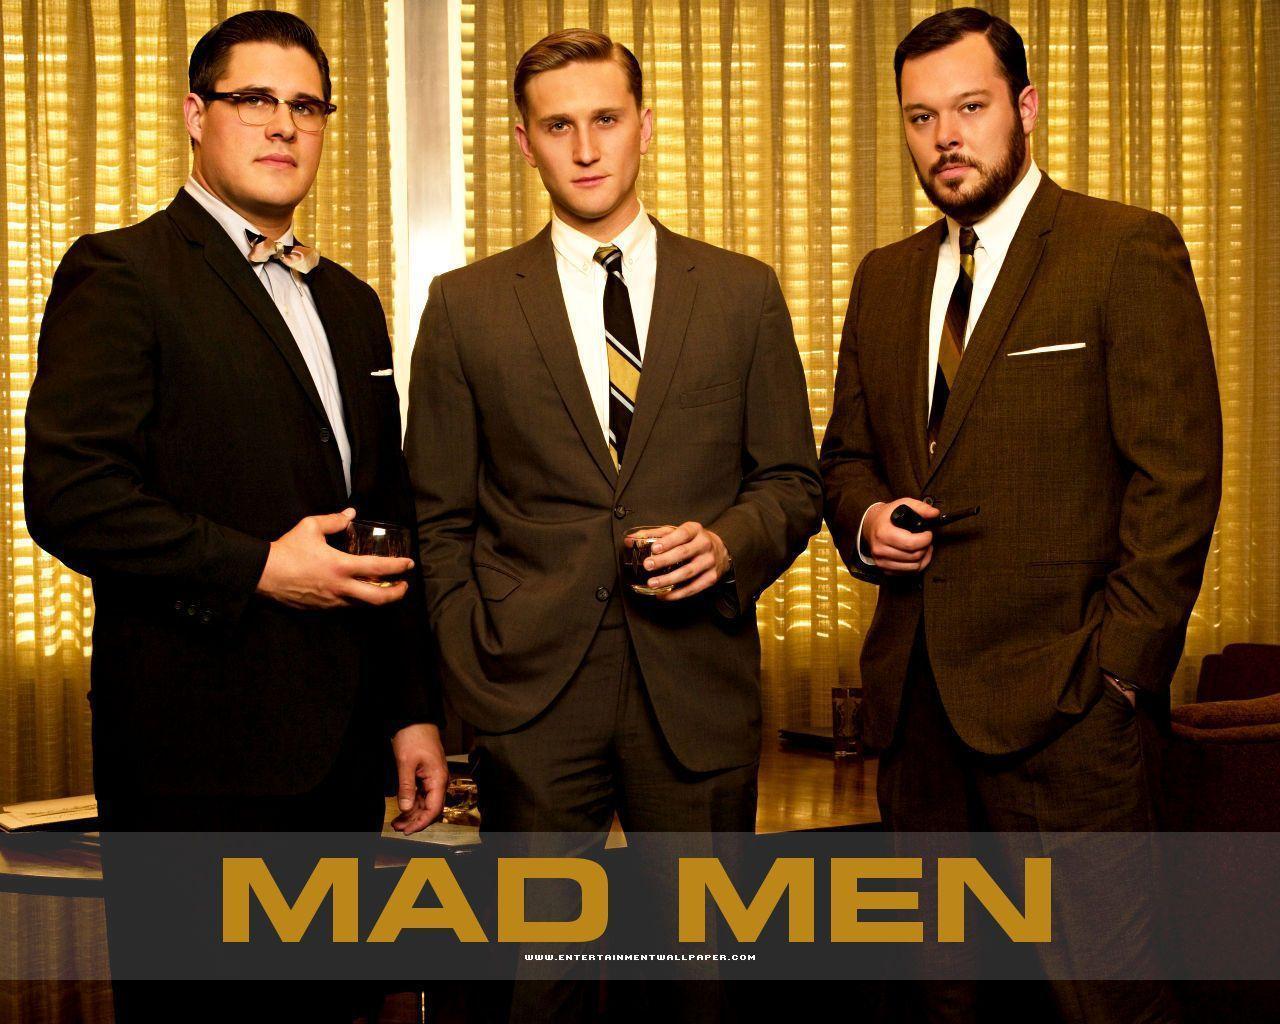 Mad Men Wallpapers - Wallpaper Cave